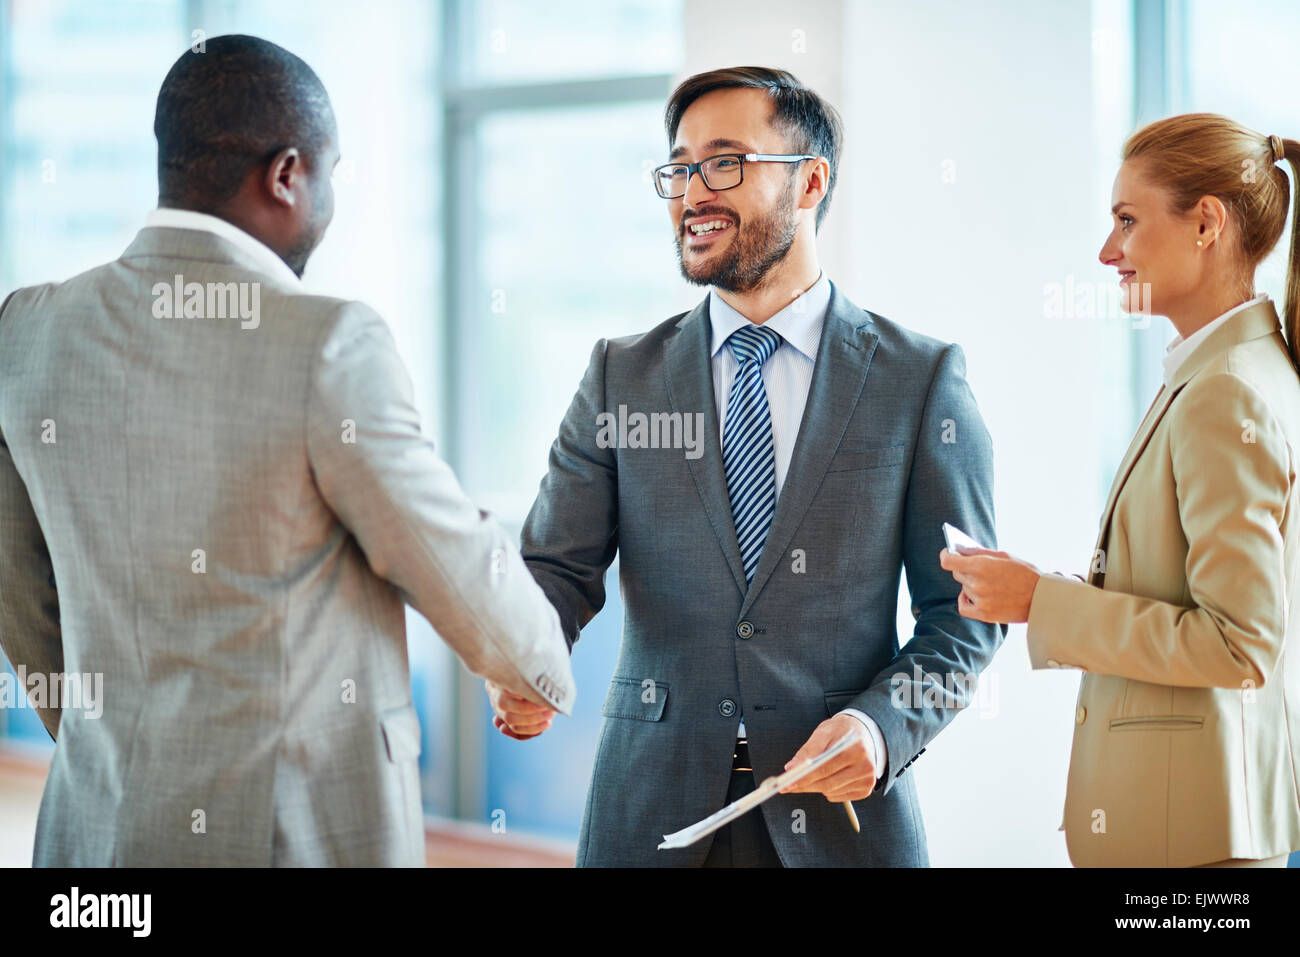 Happy businessmen handshaking after striking deal - Stock Image